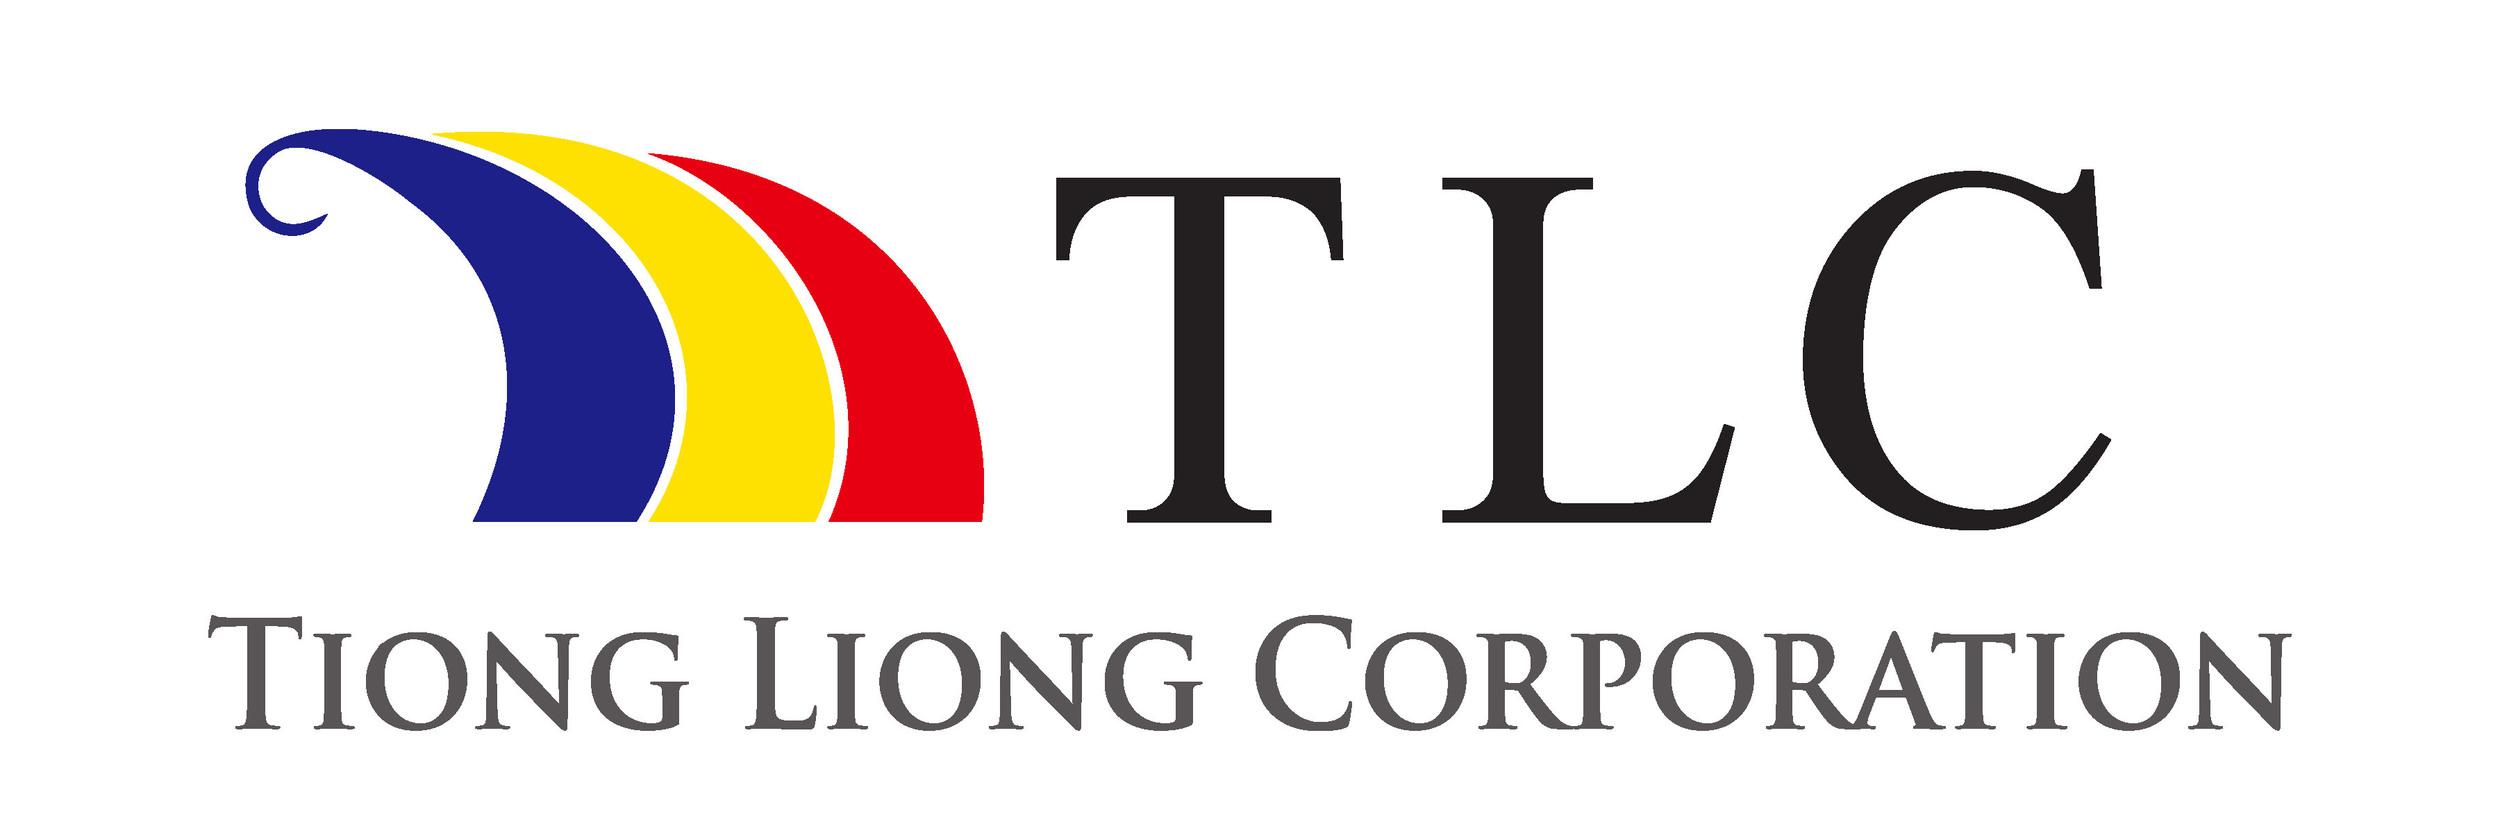 NewTLC logo_Colored.jpg